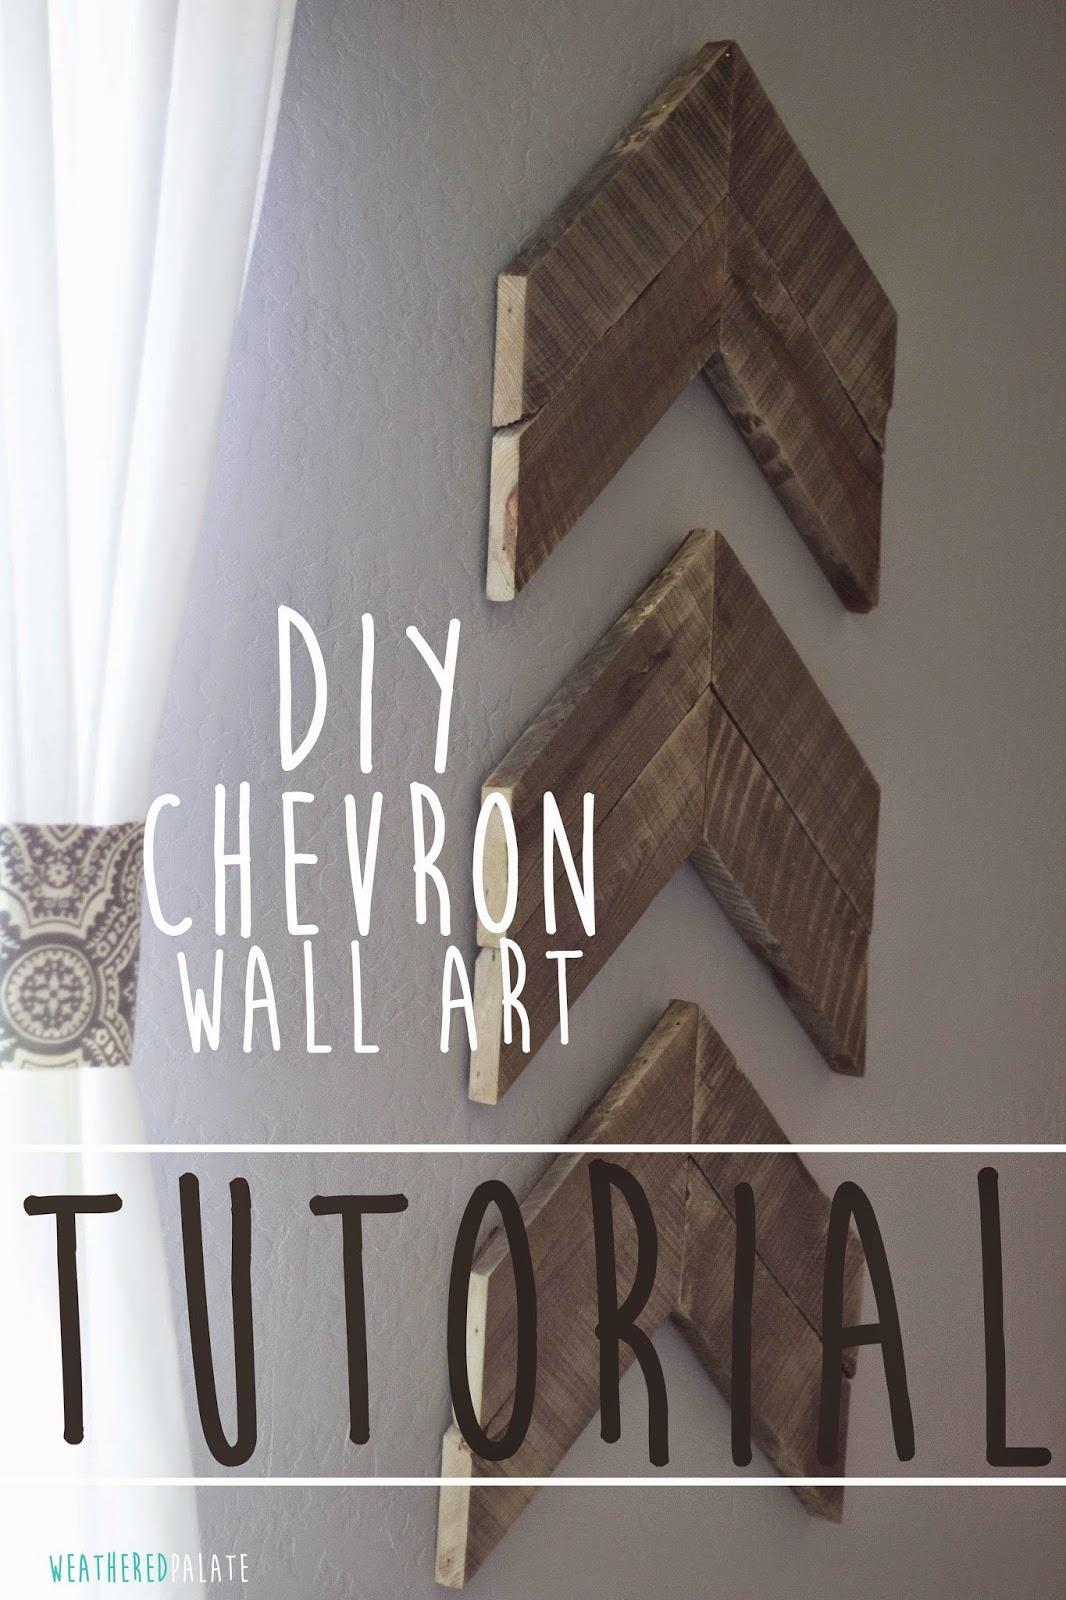 DIY Chevron Wall Art {TUTORIAL} | The Weathered Palate